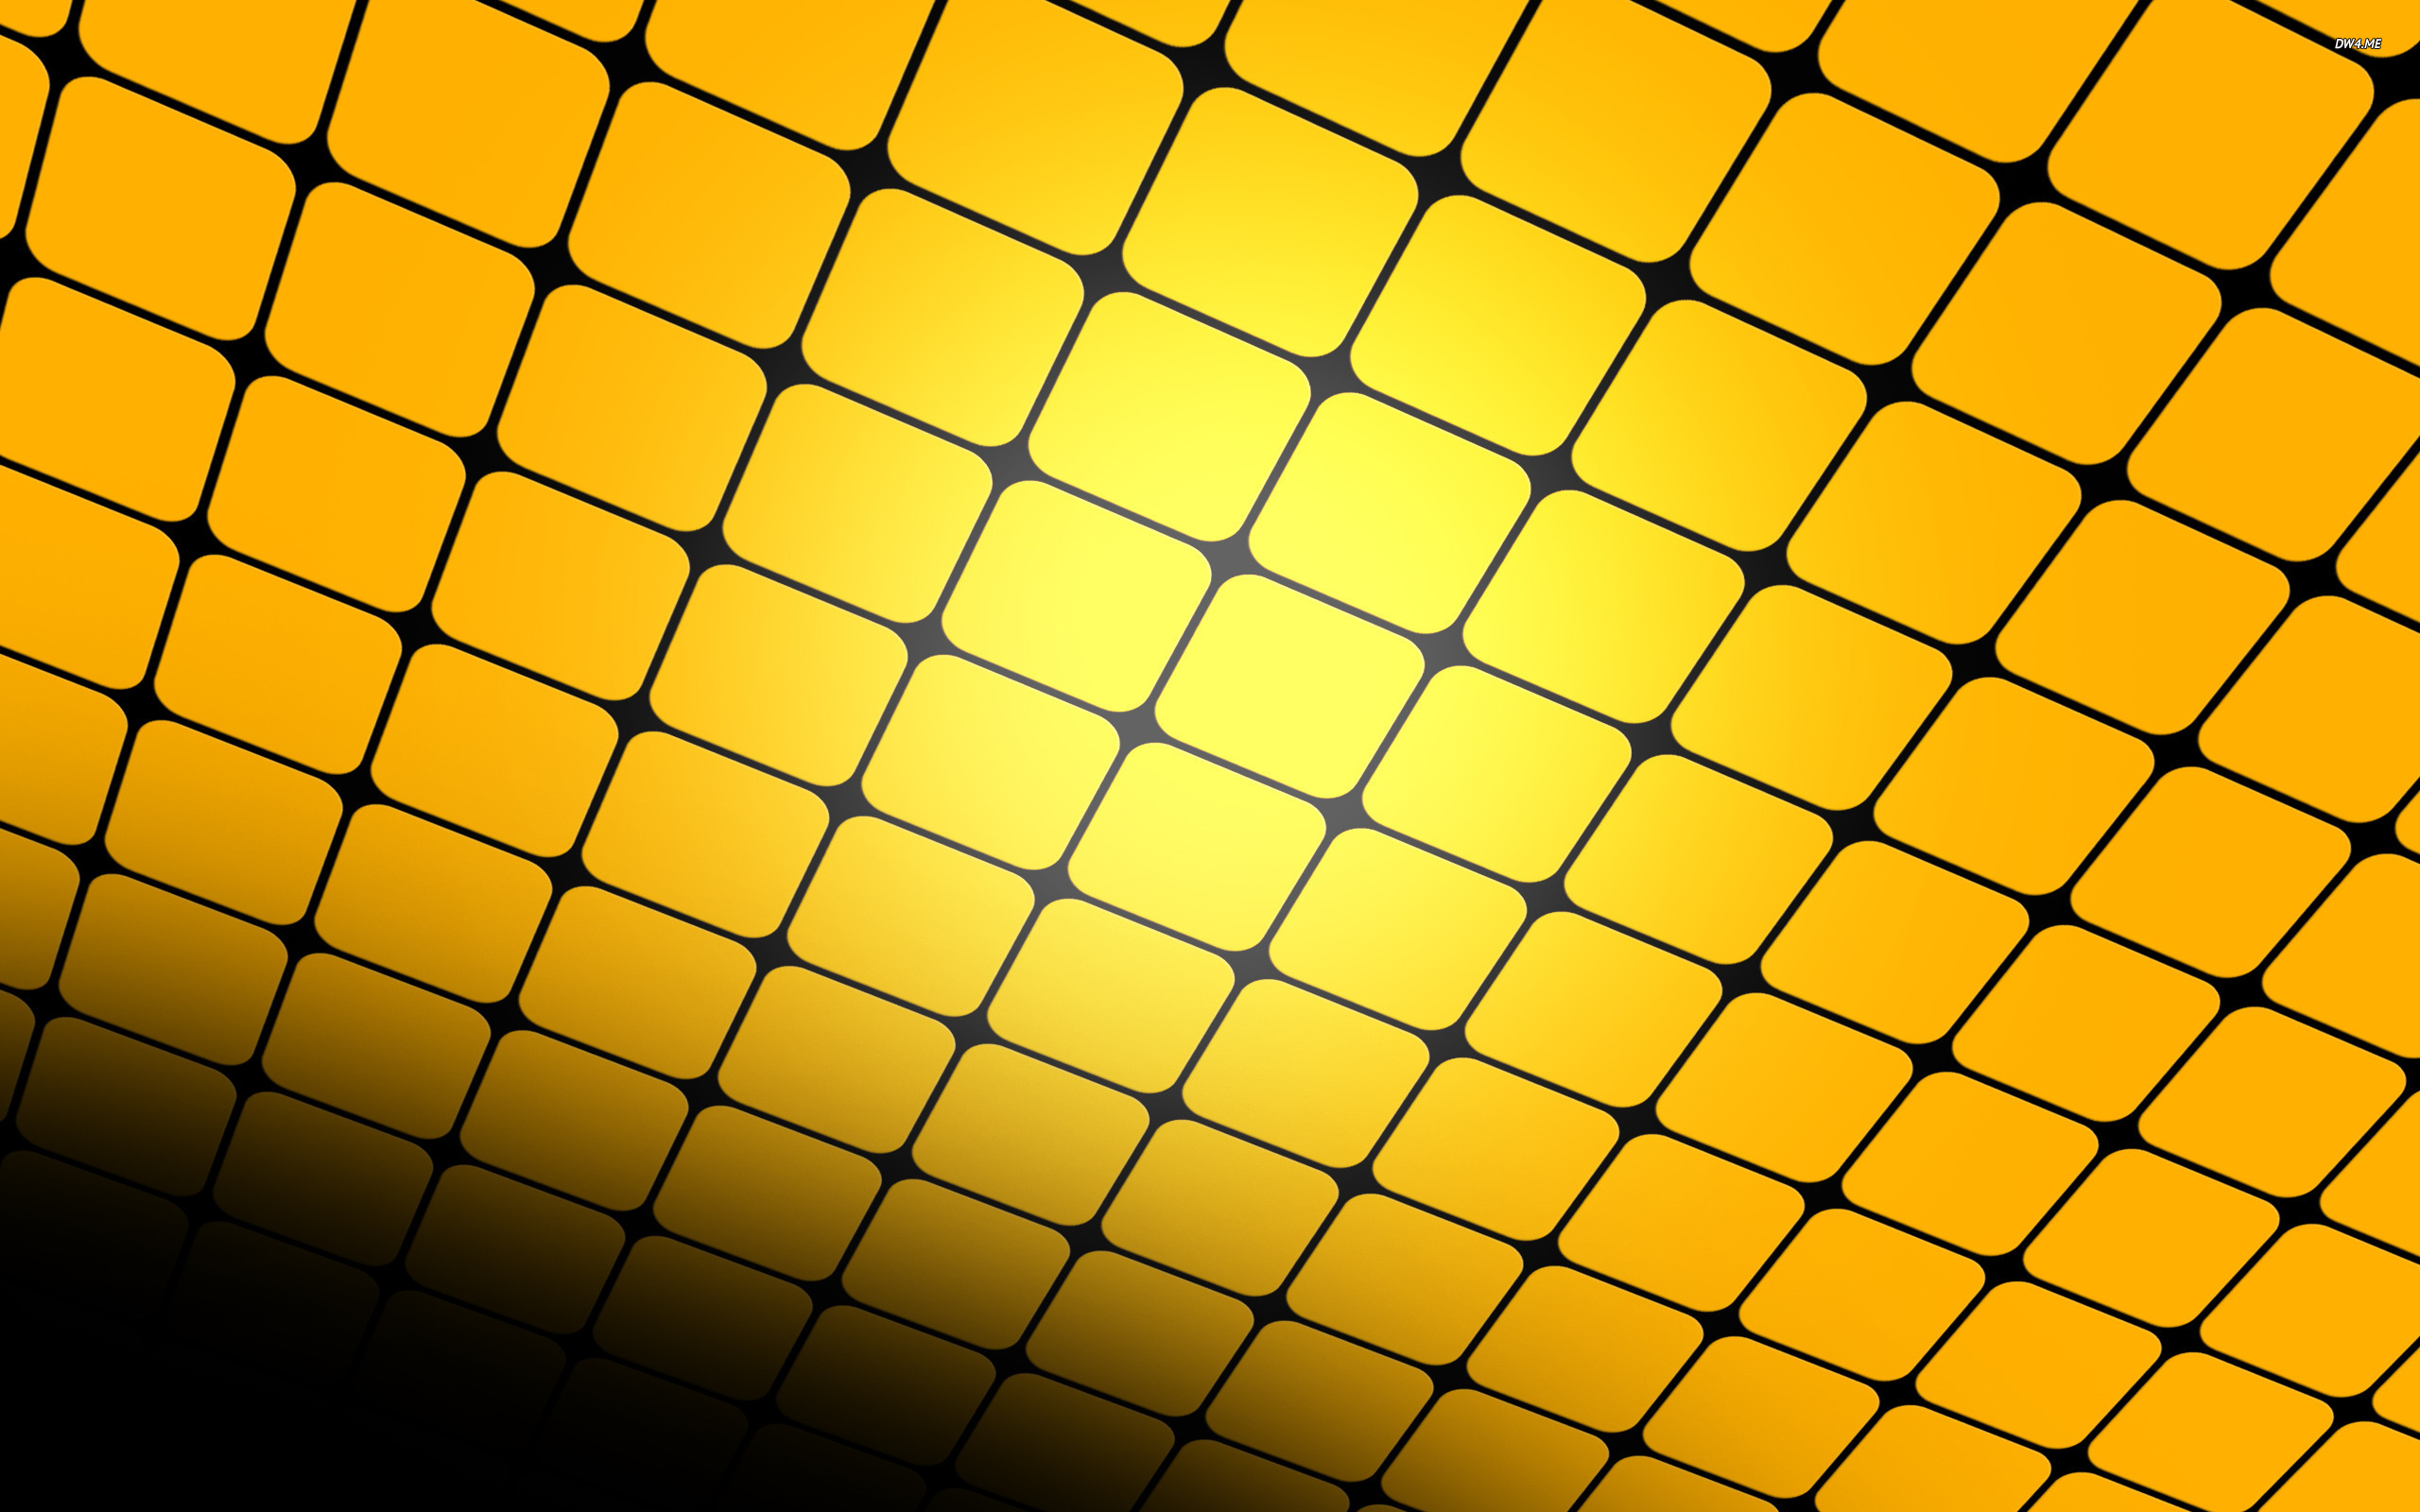 yellow abstract wallpaper hd - photo #36